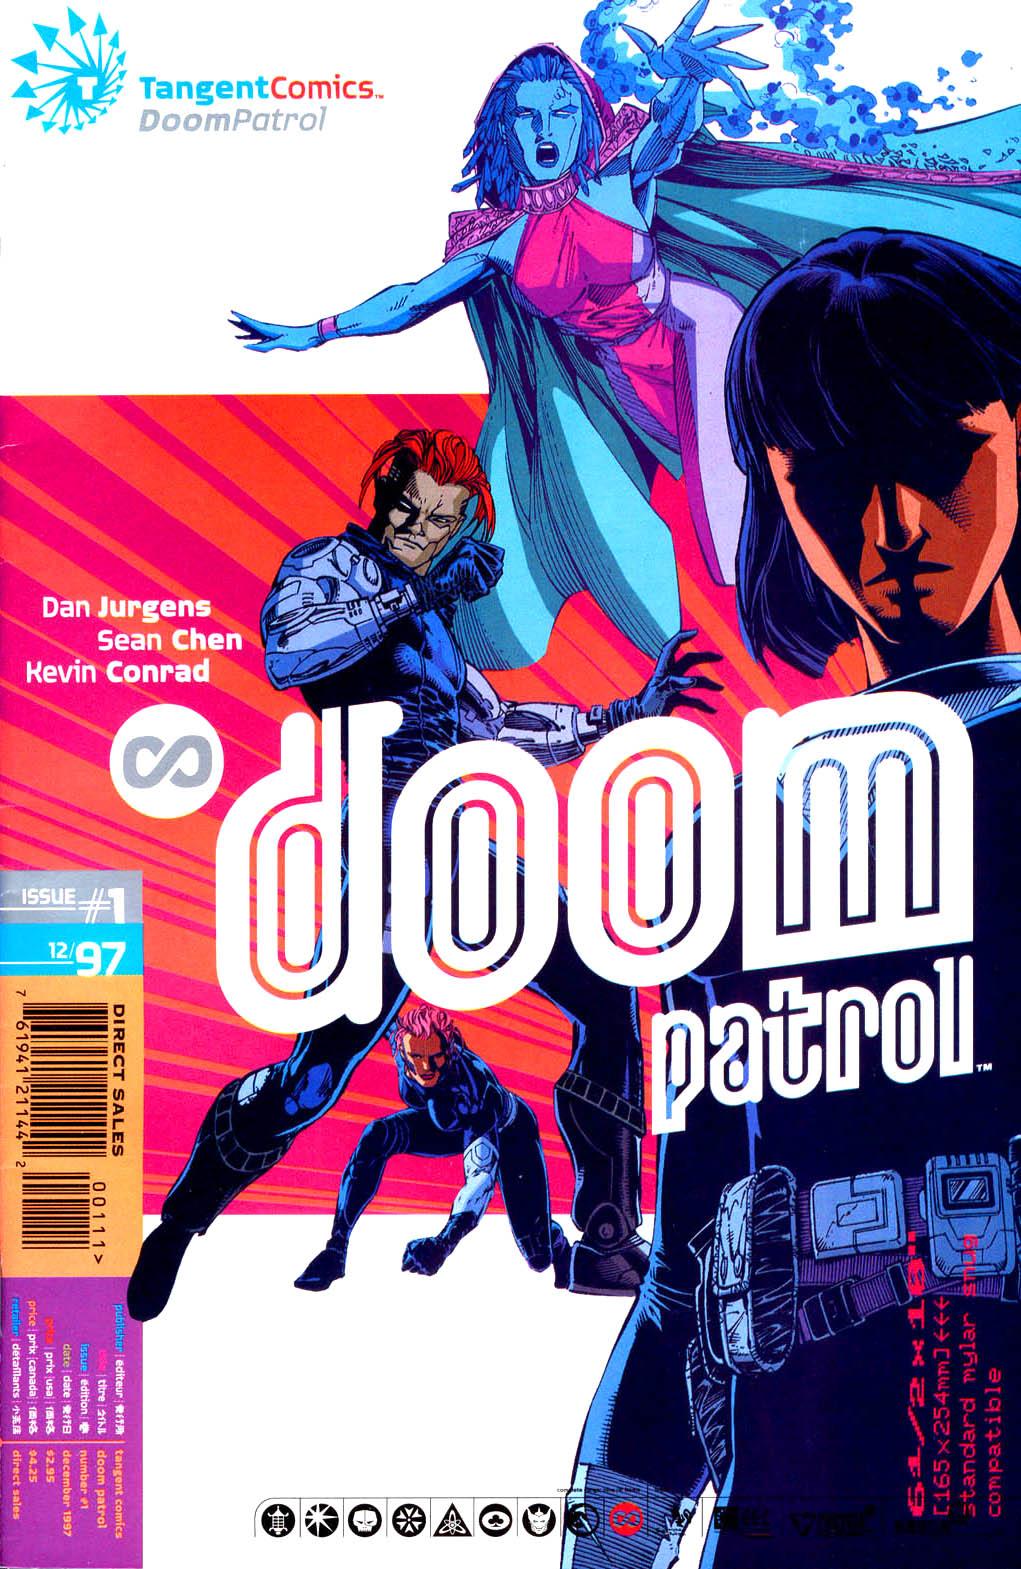 Read online Tangent Comics/ Doom Patrol comic -  Issue # Full - 1